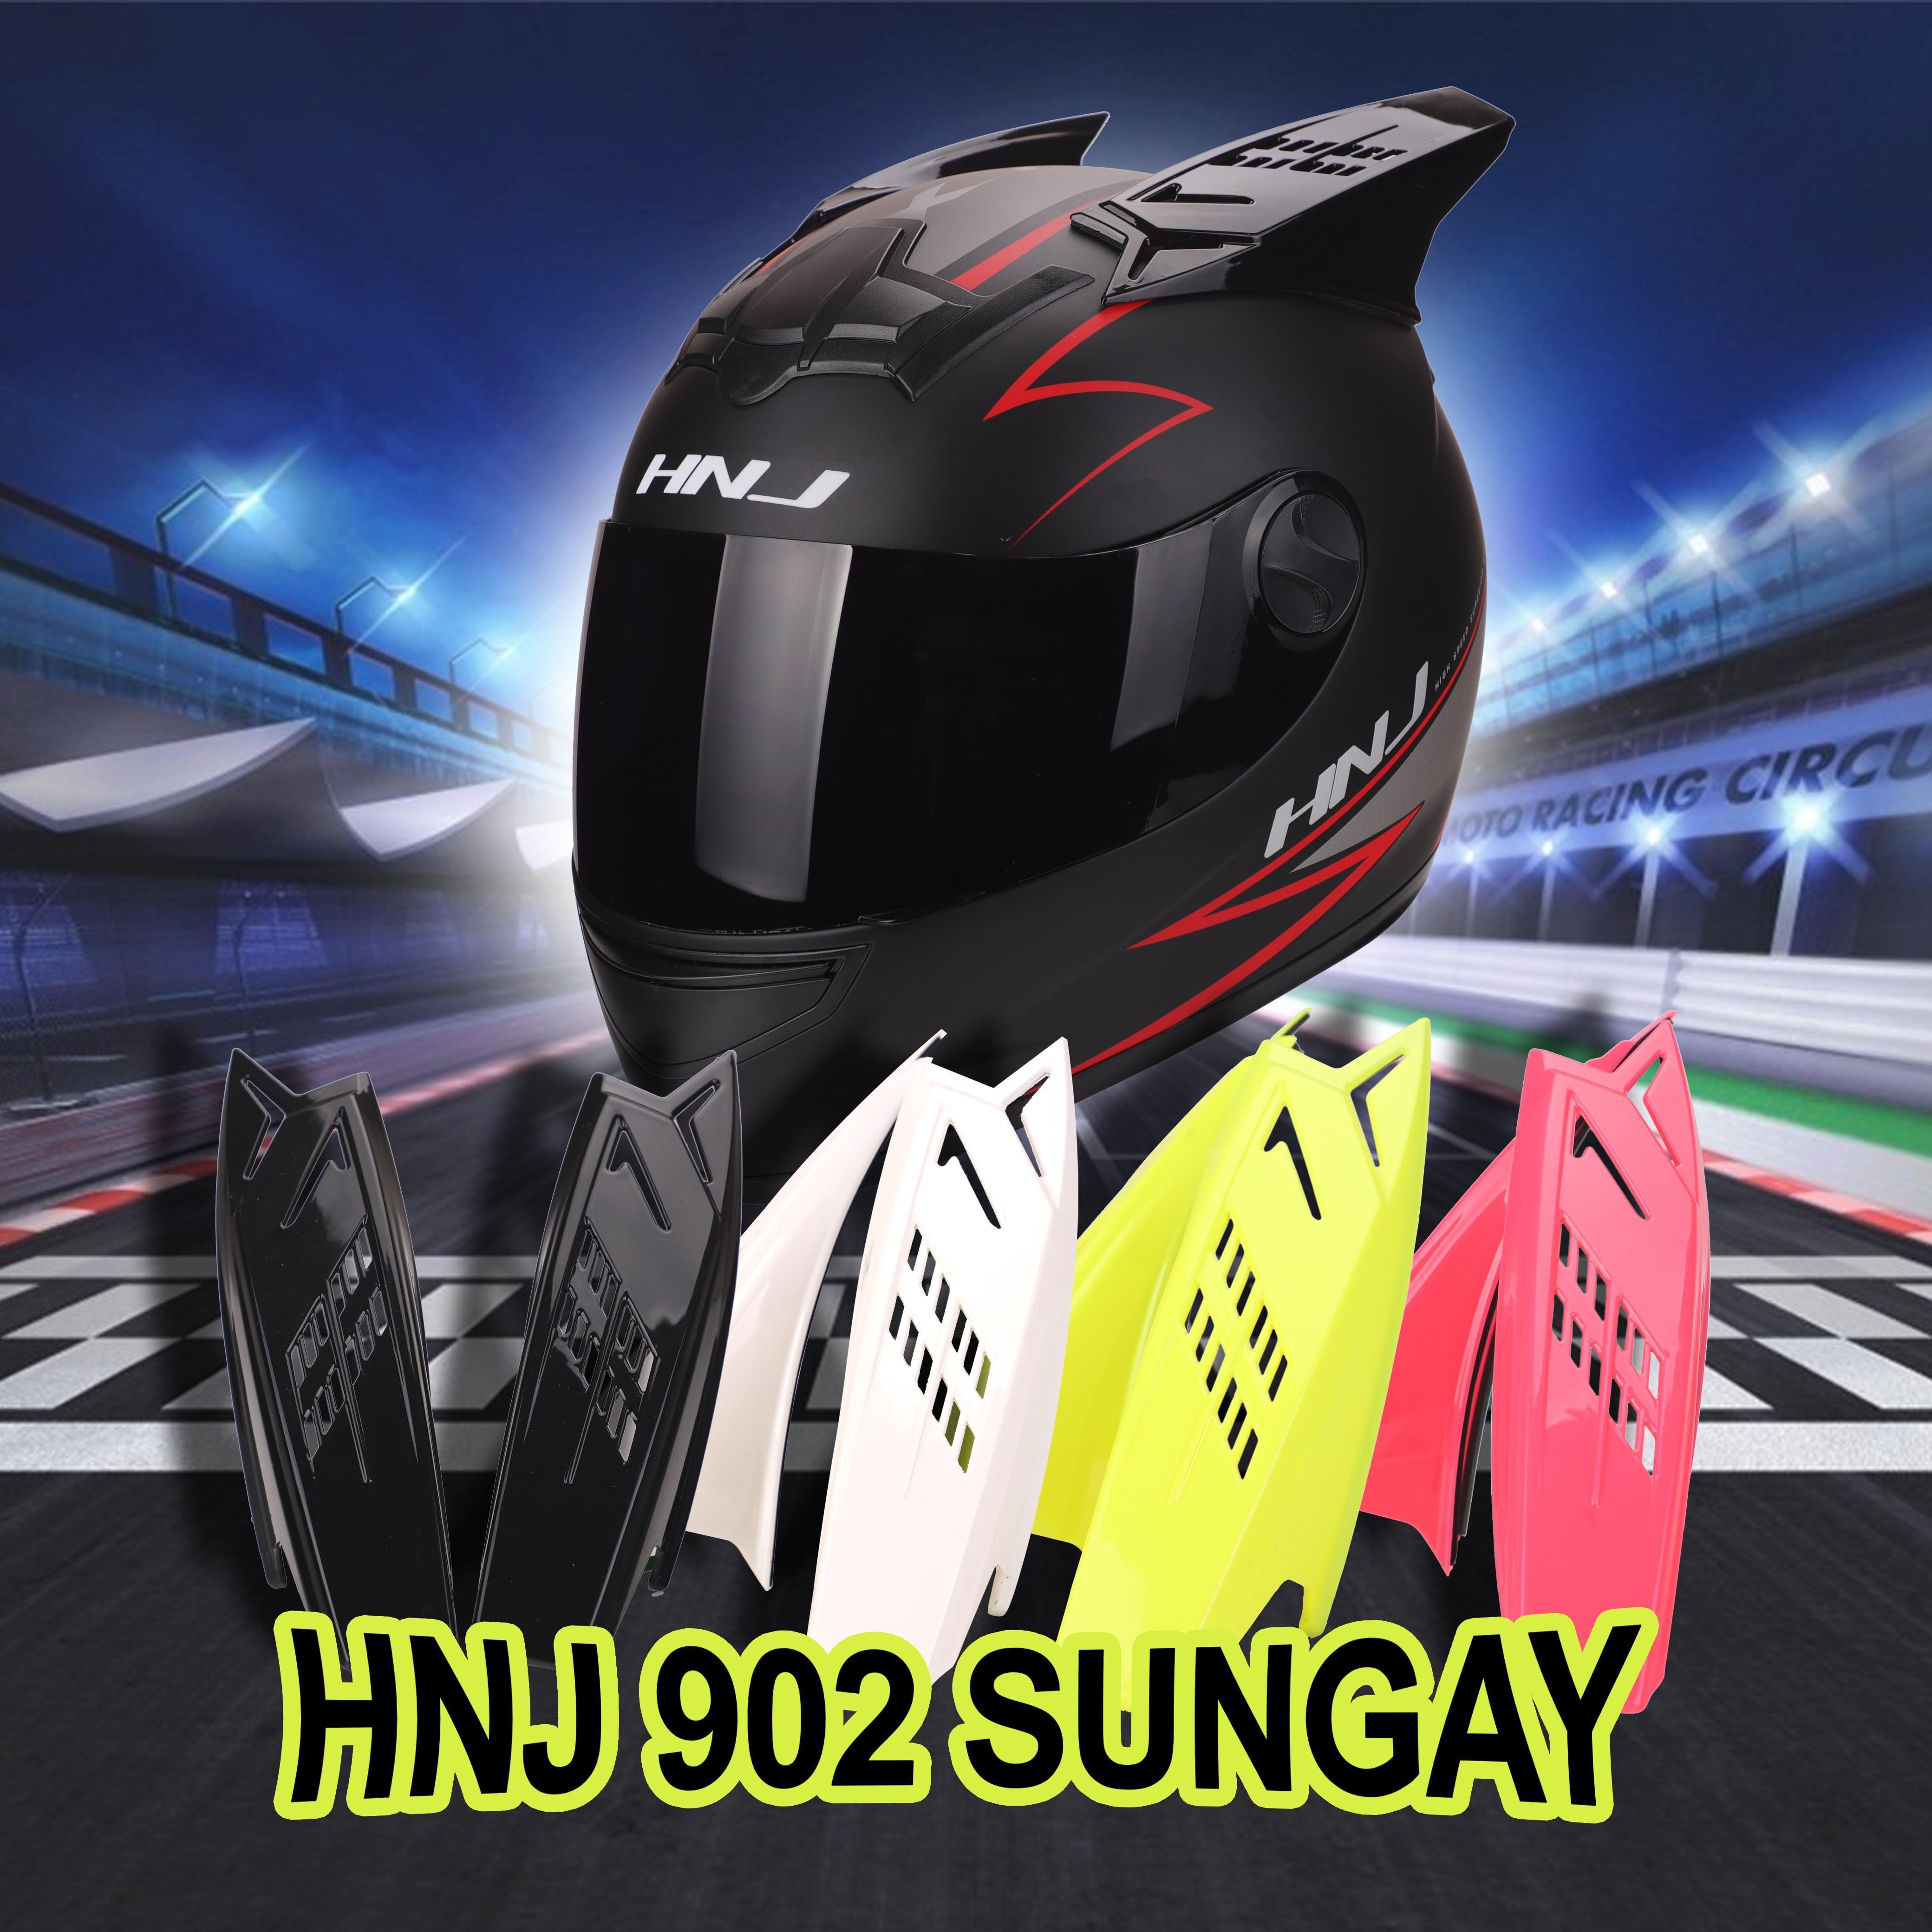 7528de4d Motorbike Helmets for sale - Motorcycle Helmet Accessories online brands,  prices & reviews in Philippines | Lazada.com.ph